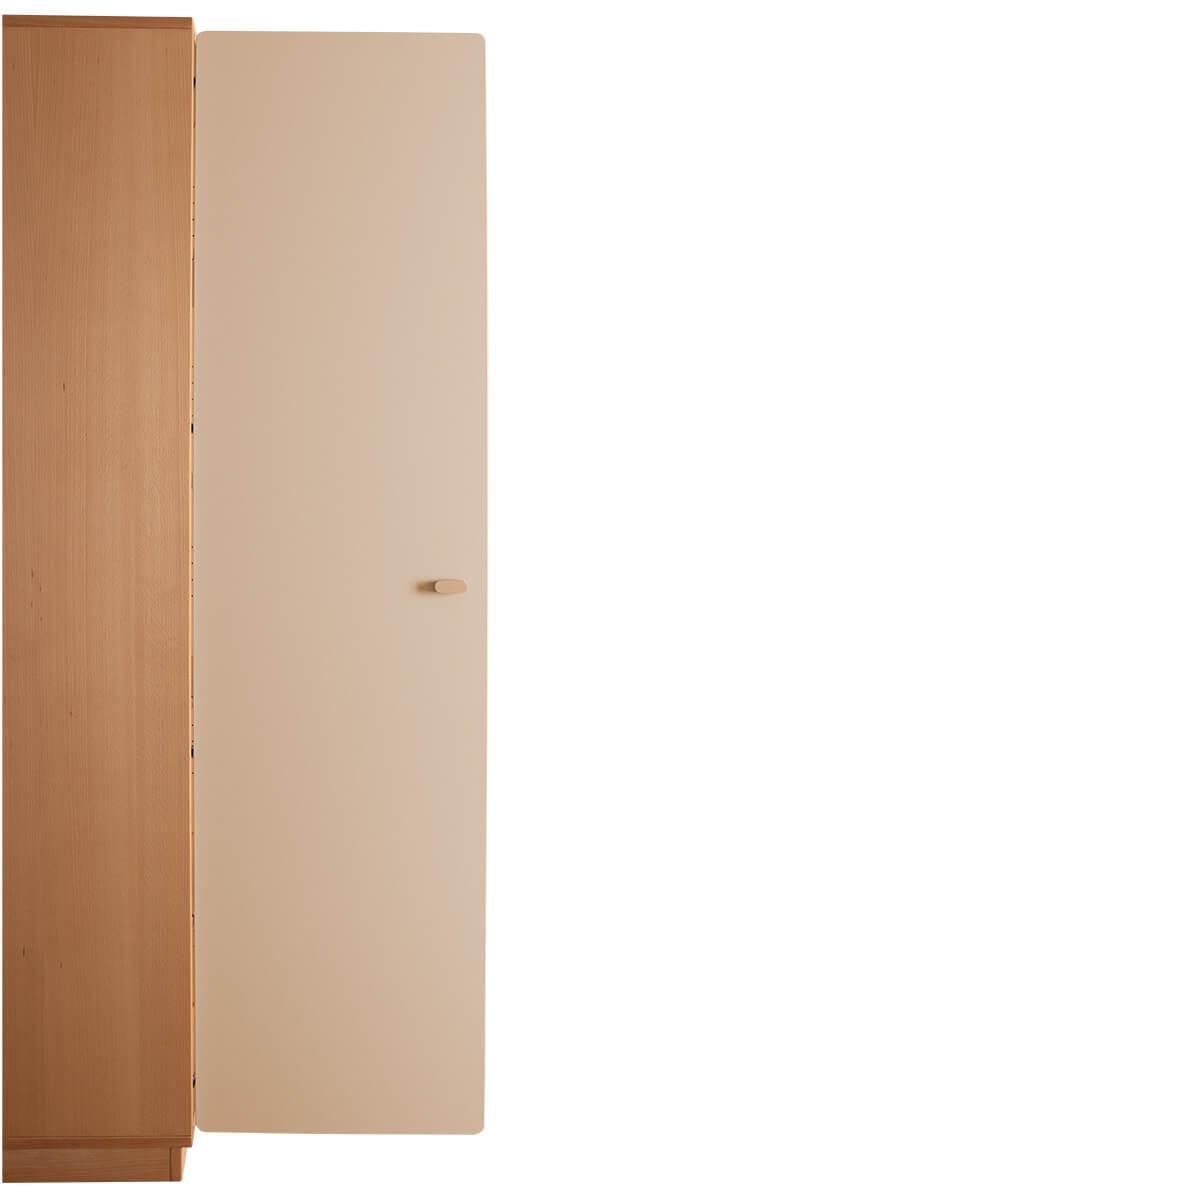 Schranktür 5/5 176cm-Griff DESTYLE Debreuyn  MDF hellgrau-lackiert